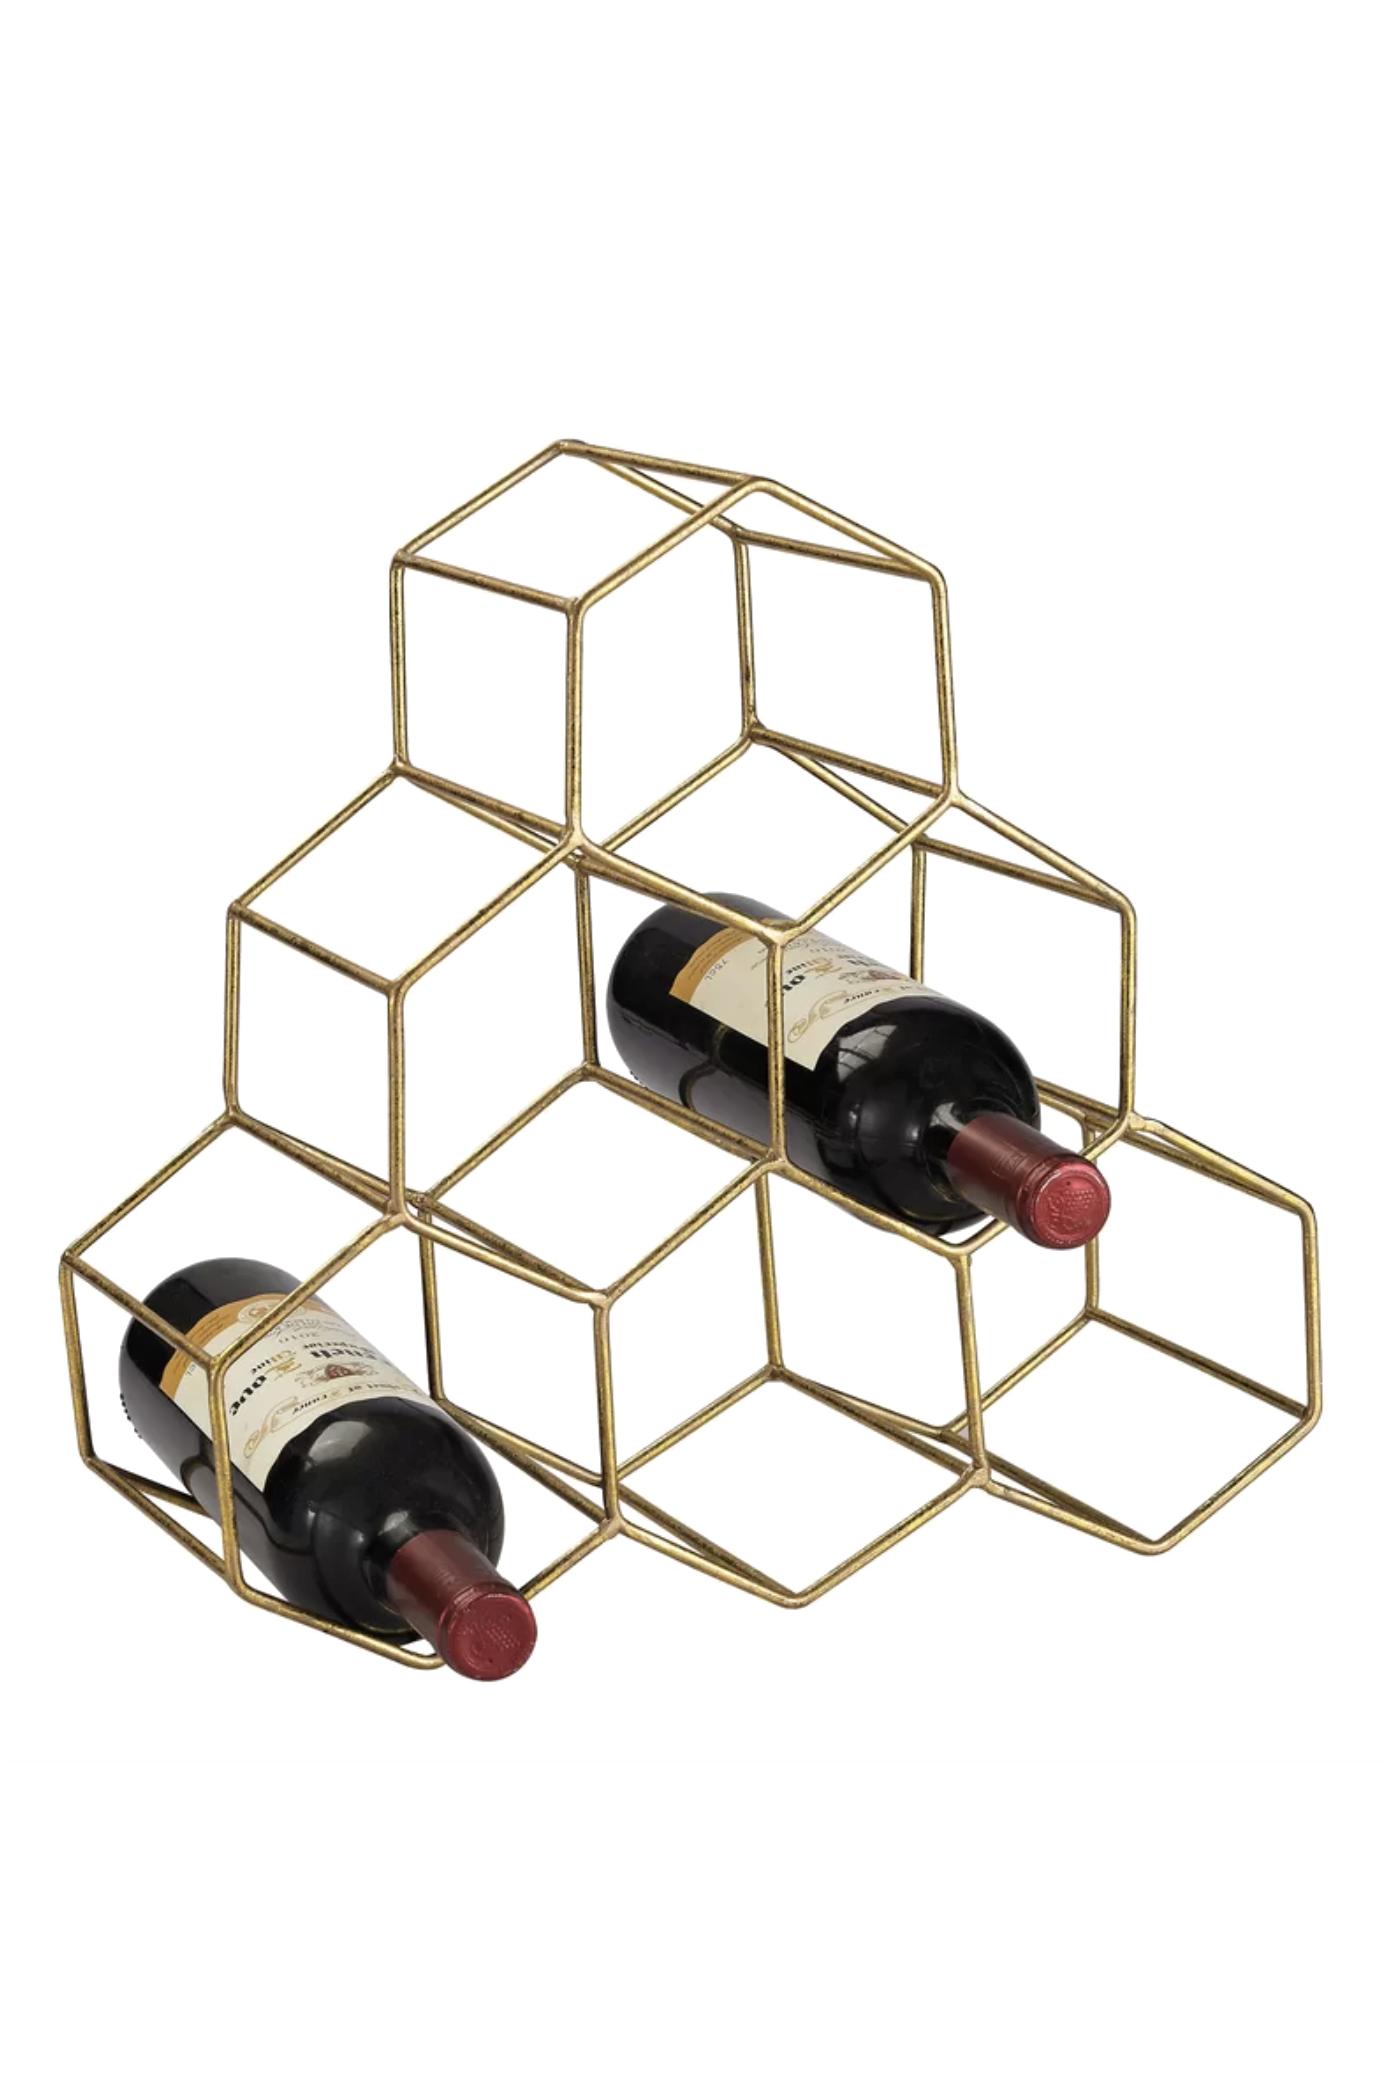 15 Best Wine Racks Of 2021 Wall Countertop Holders For Wine